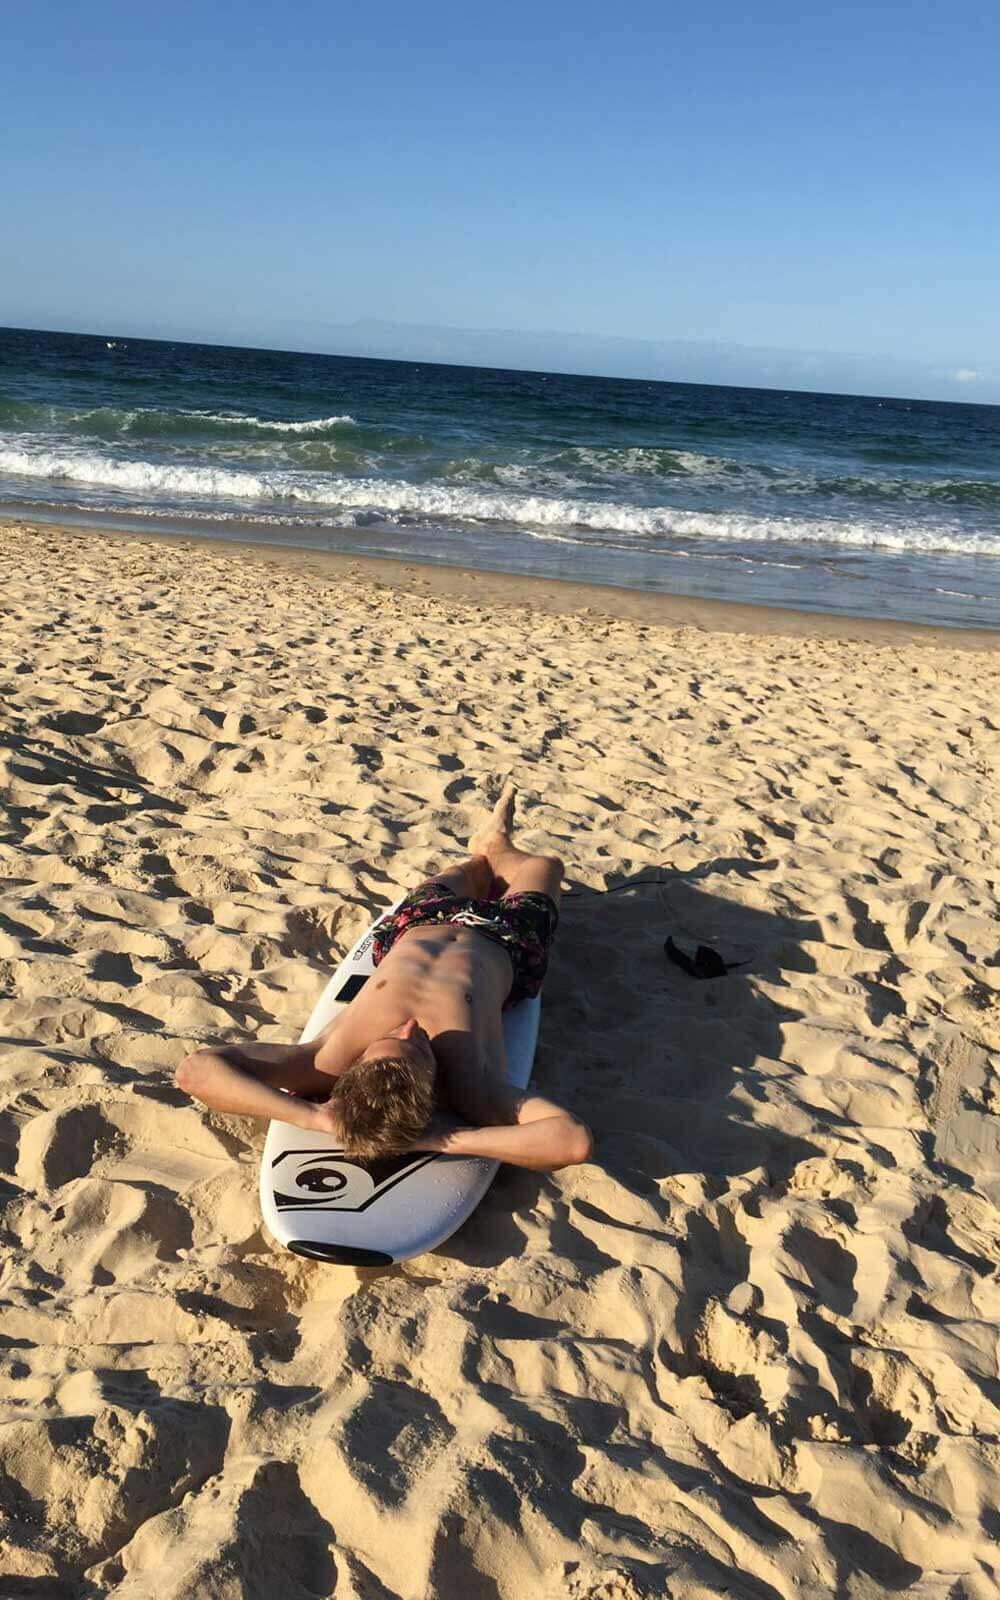 Paul lliegt am Strand auf seinem Surfbrett